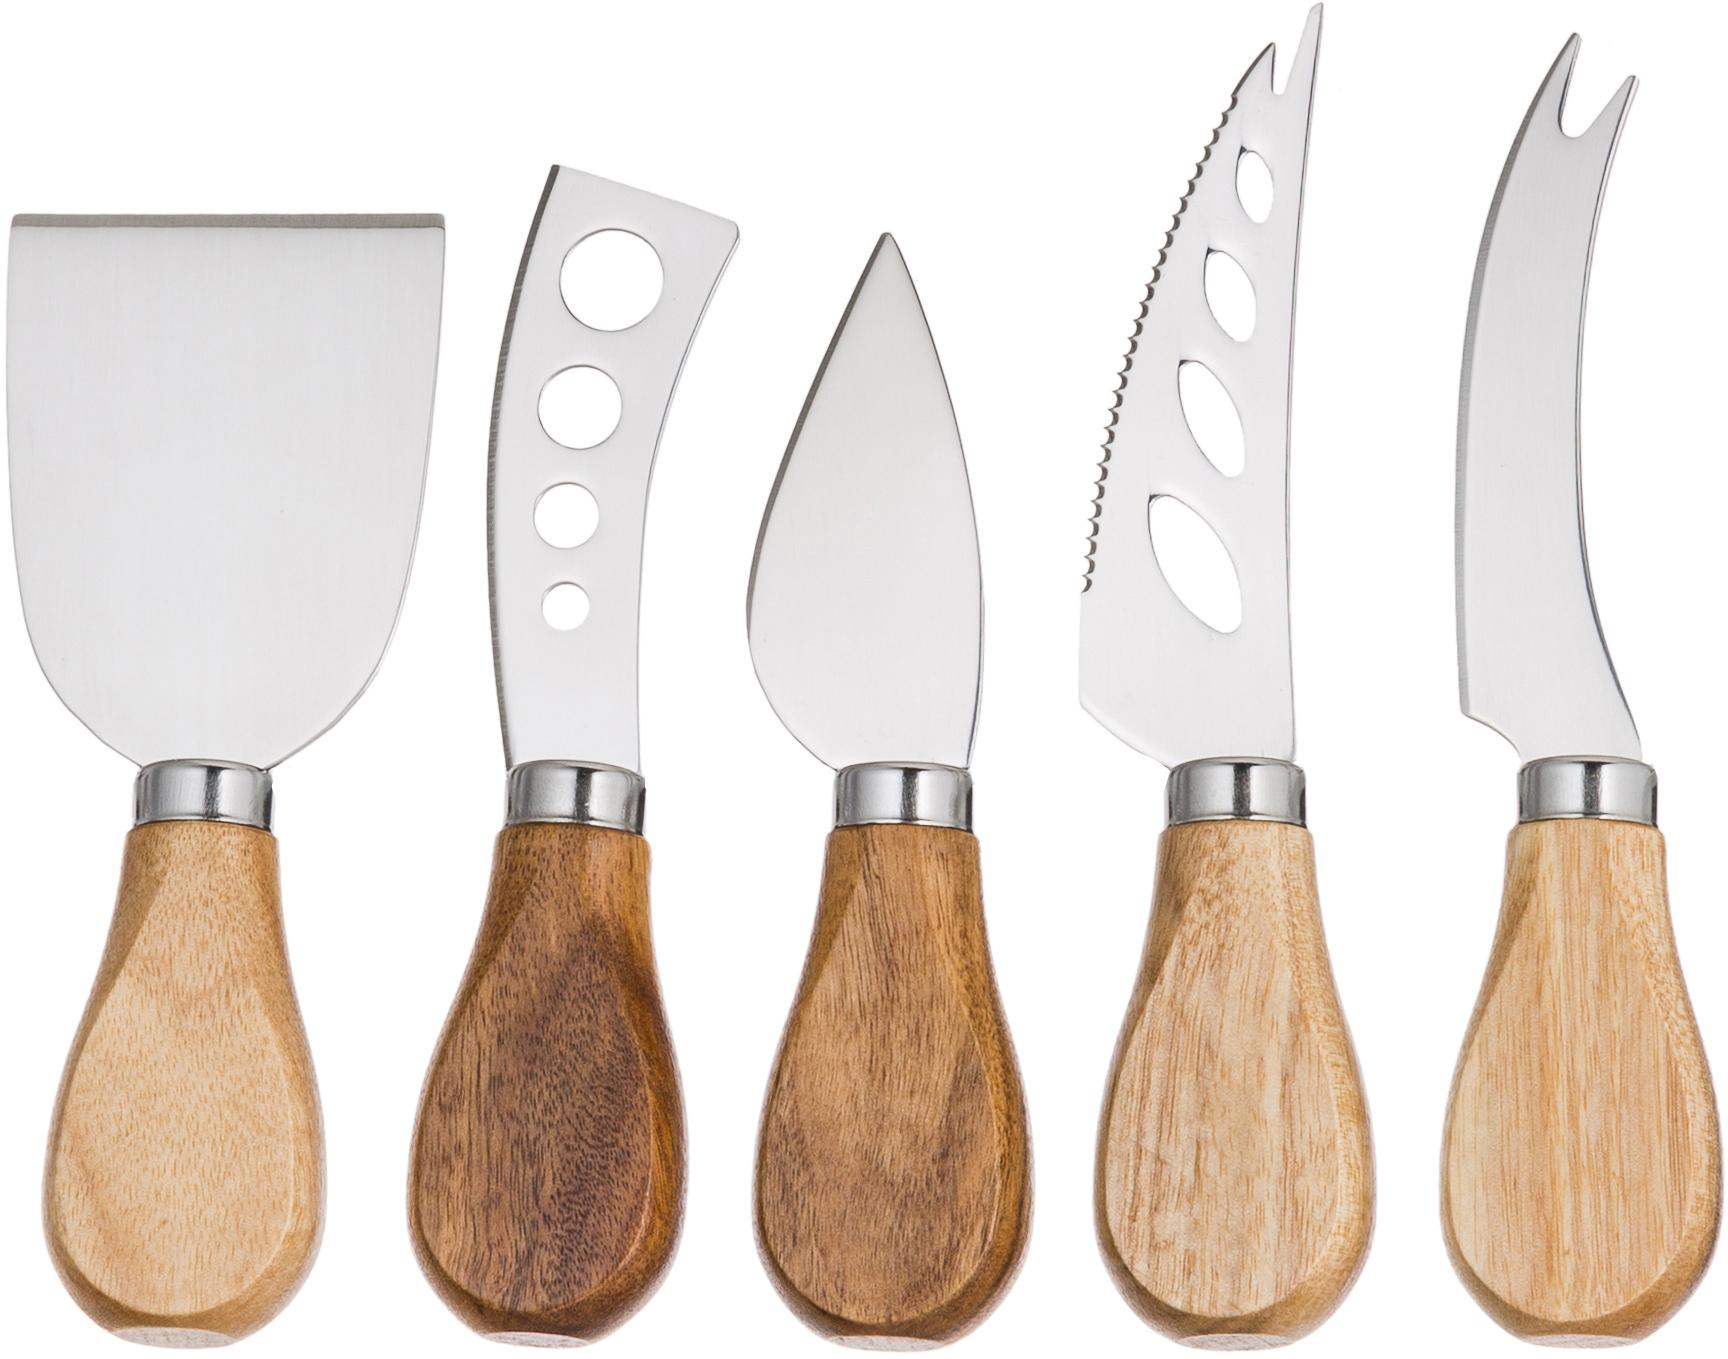 Set de cuchillos de queso Frija, 5pzas., Madera, acero inoxidable, Set de diferentes tamaños